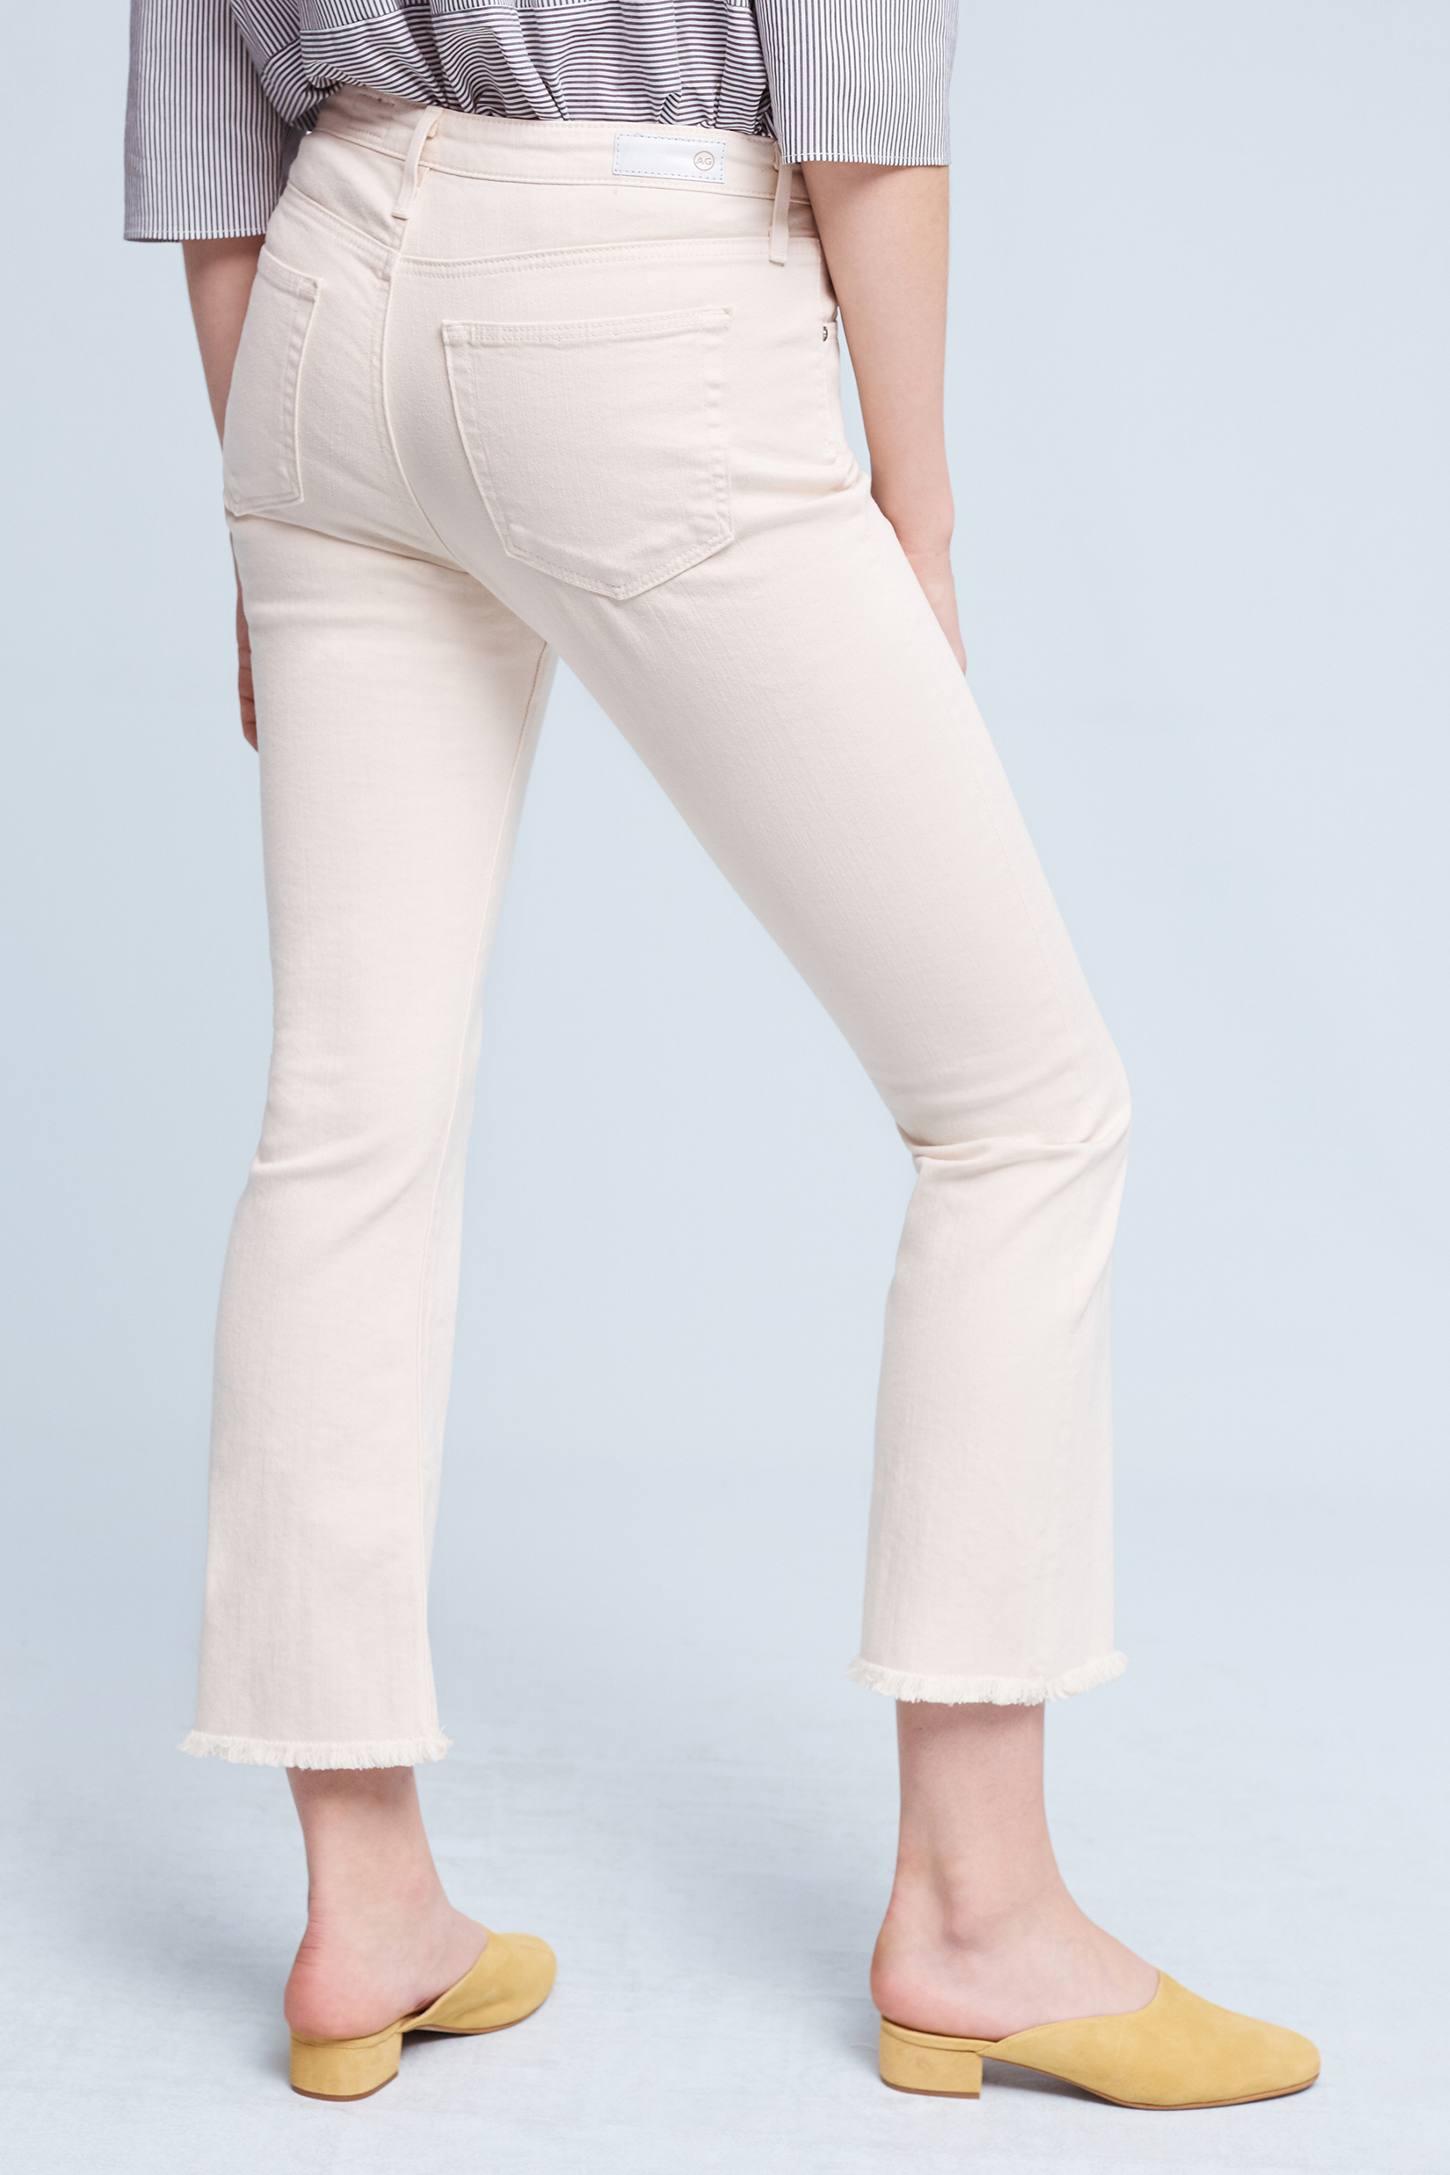 AG Jodi High-Rise Kick-Flare Jeans   Anthropologie